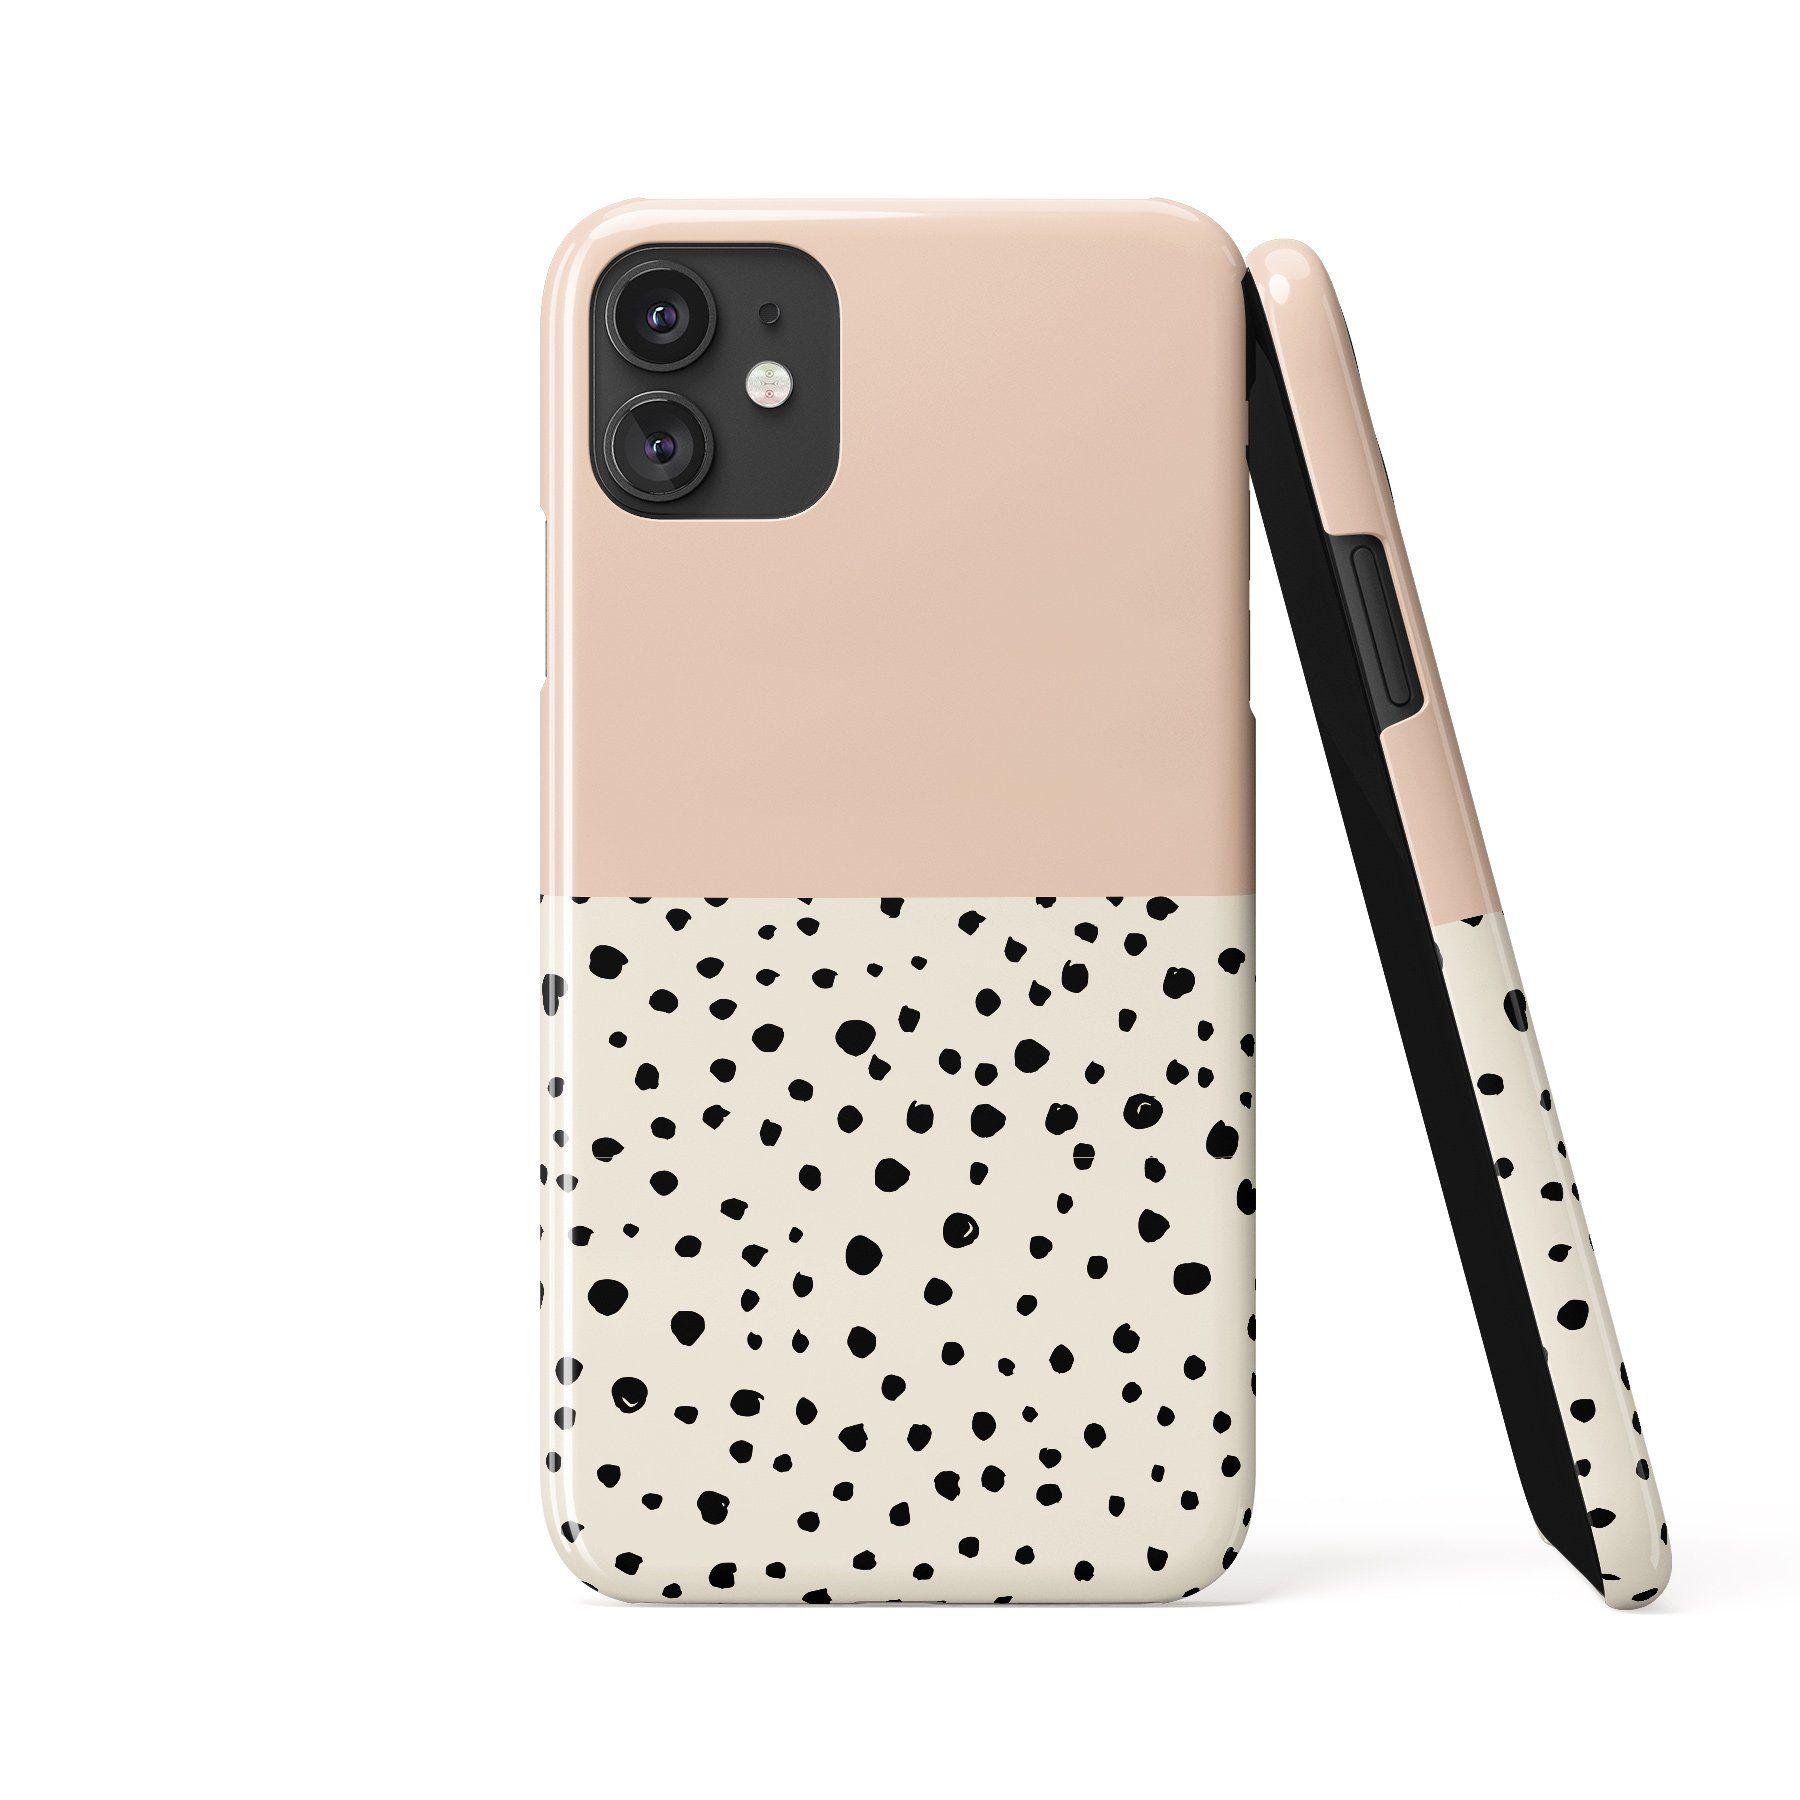 LIV GEO DOTS Peach Cream Phone Case - iPhone 13 Pro Max / Snap Case - Gloss